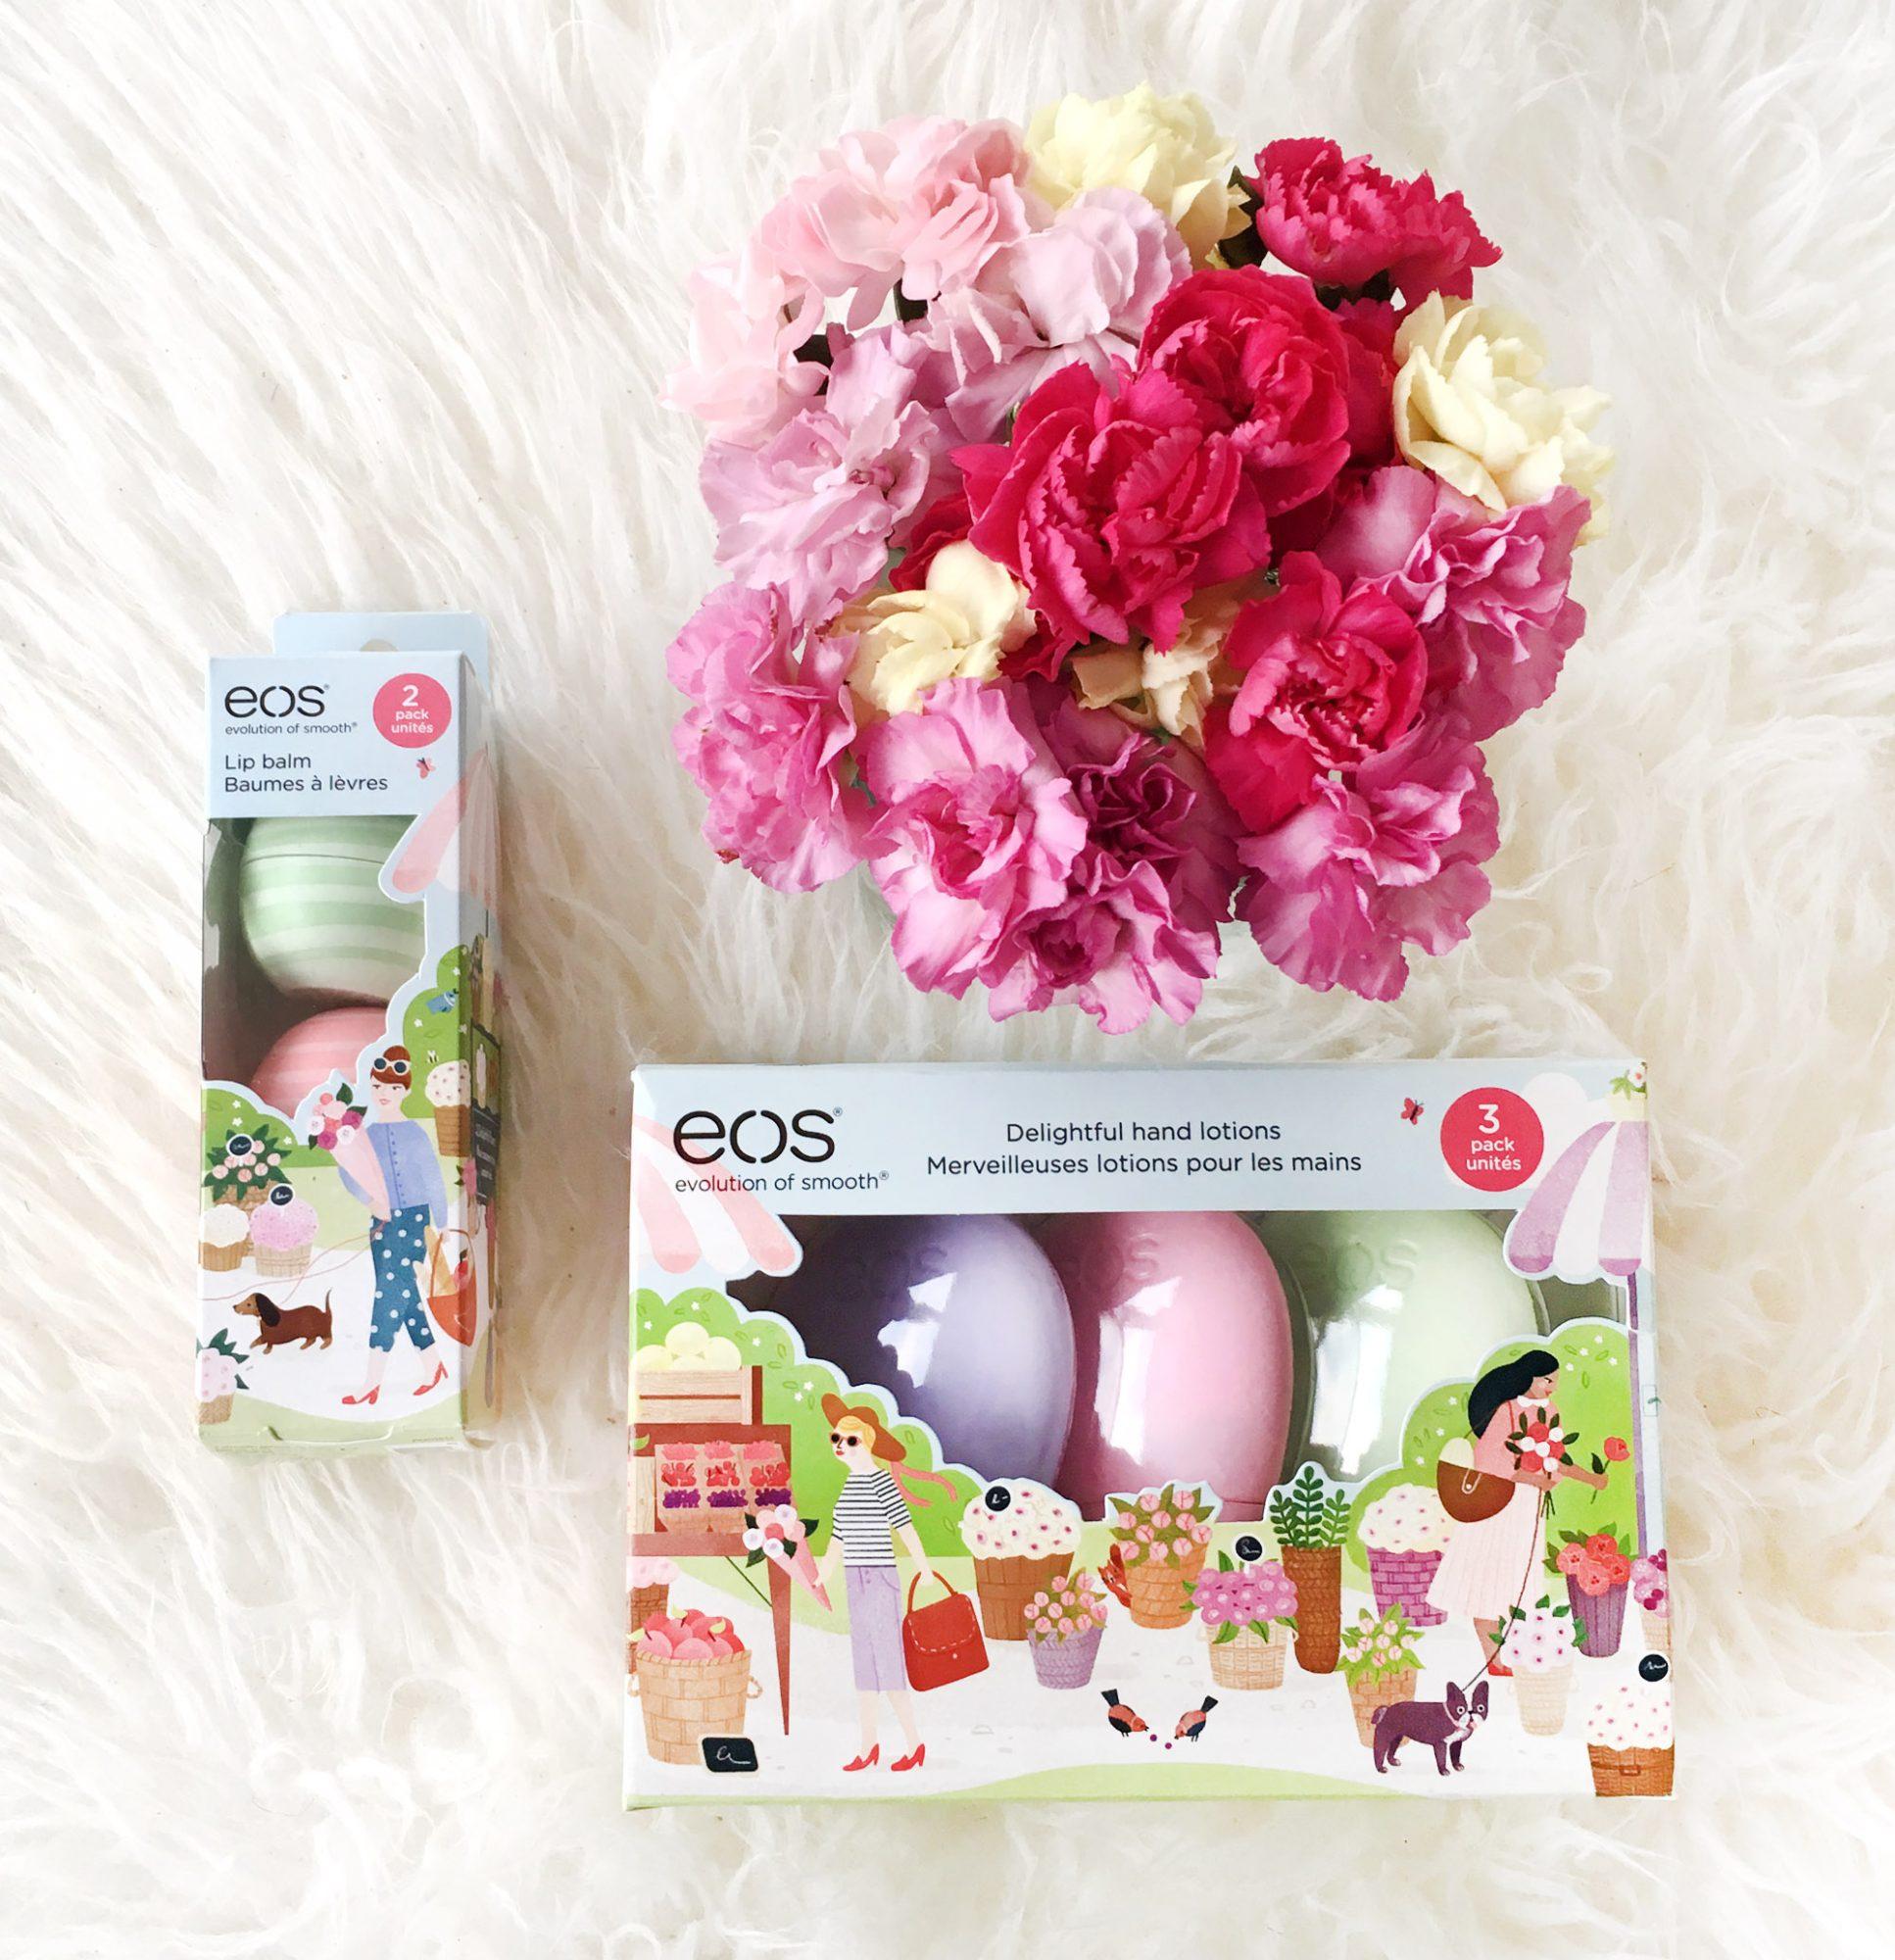 EOS Spring Essentials Lip Balm & Hand Lotion